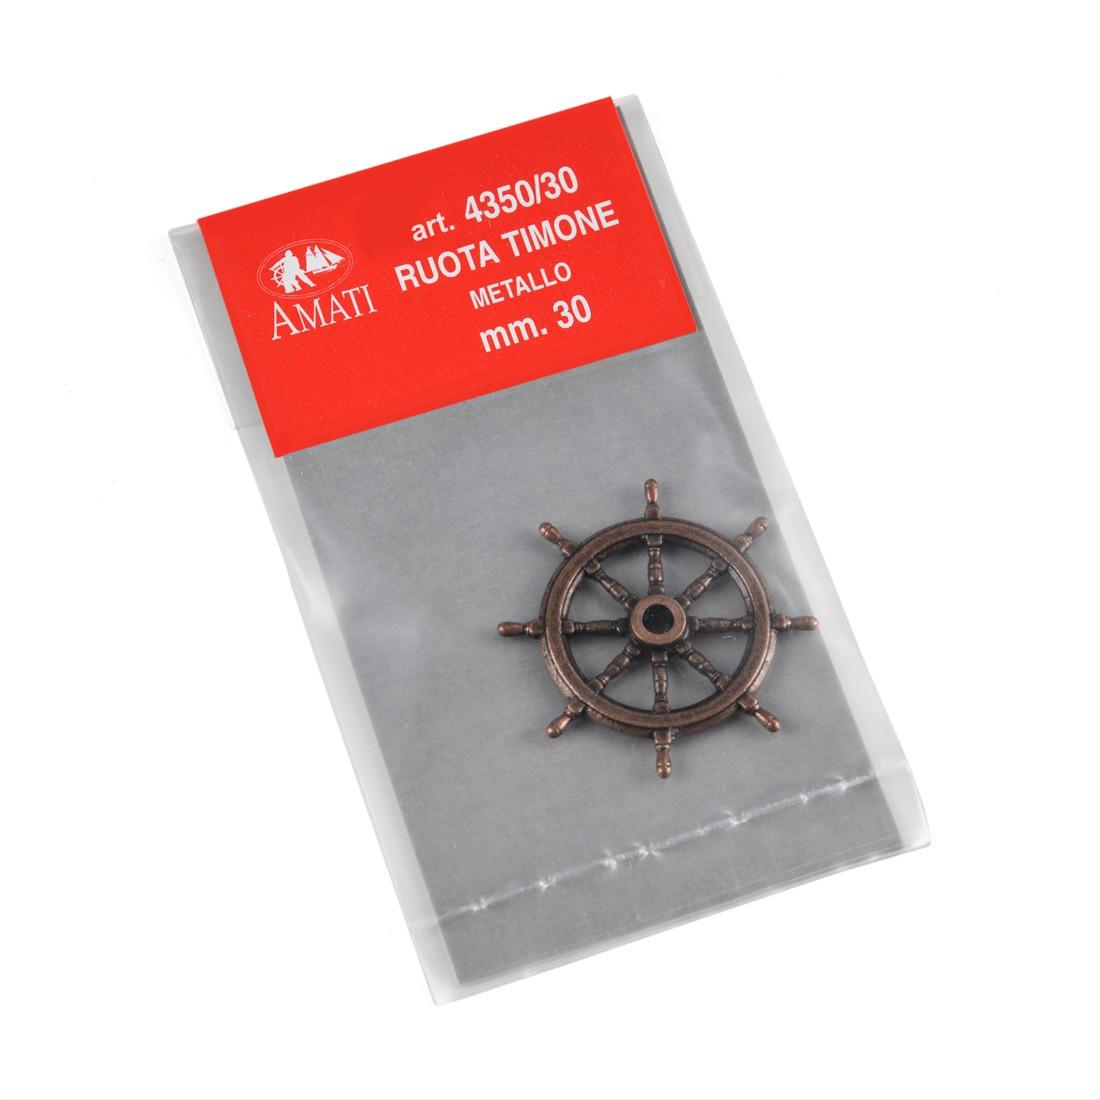 Roues gouvernail métal 30 mm.